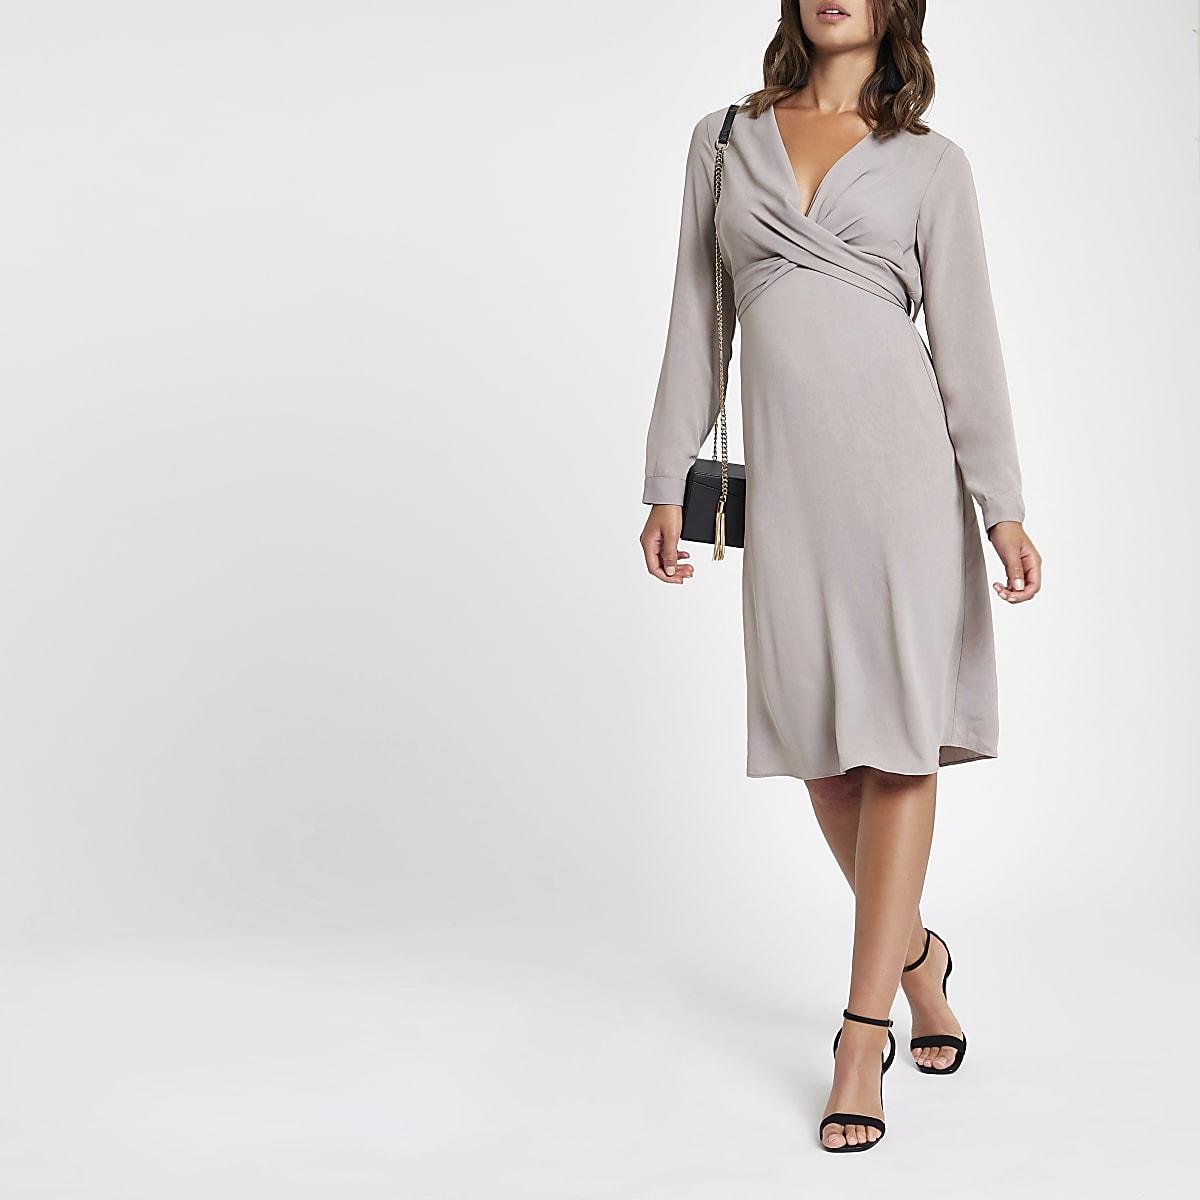 358a5d5493766e Grijze midi-jurk met overslag en V-hals - Bodyconjurken - Jurken - Dames